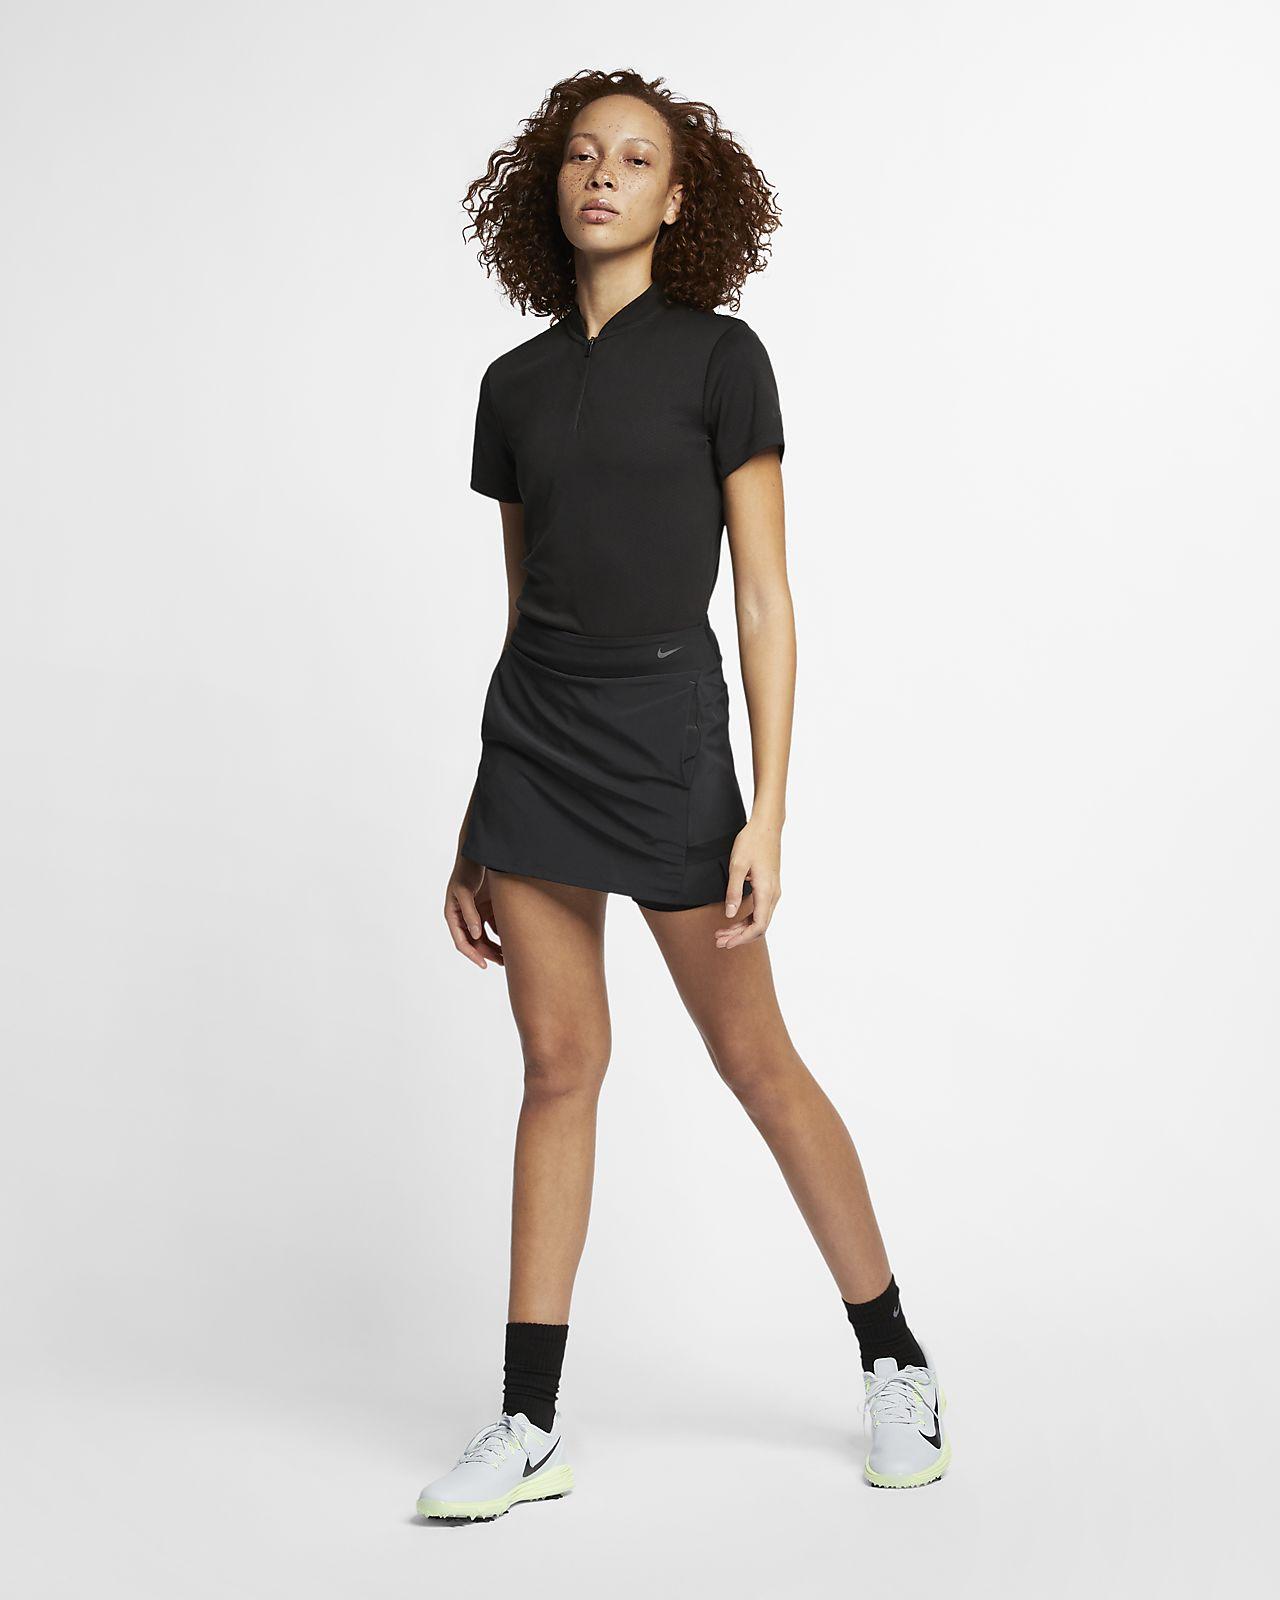 76b8755564 Nike Flex Women's 15